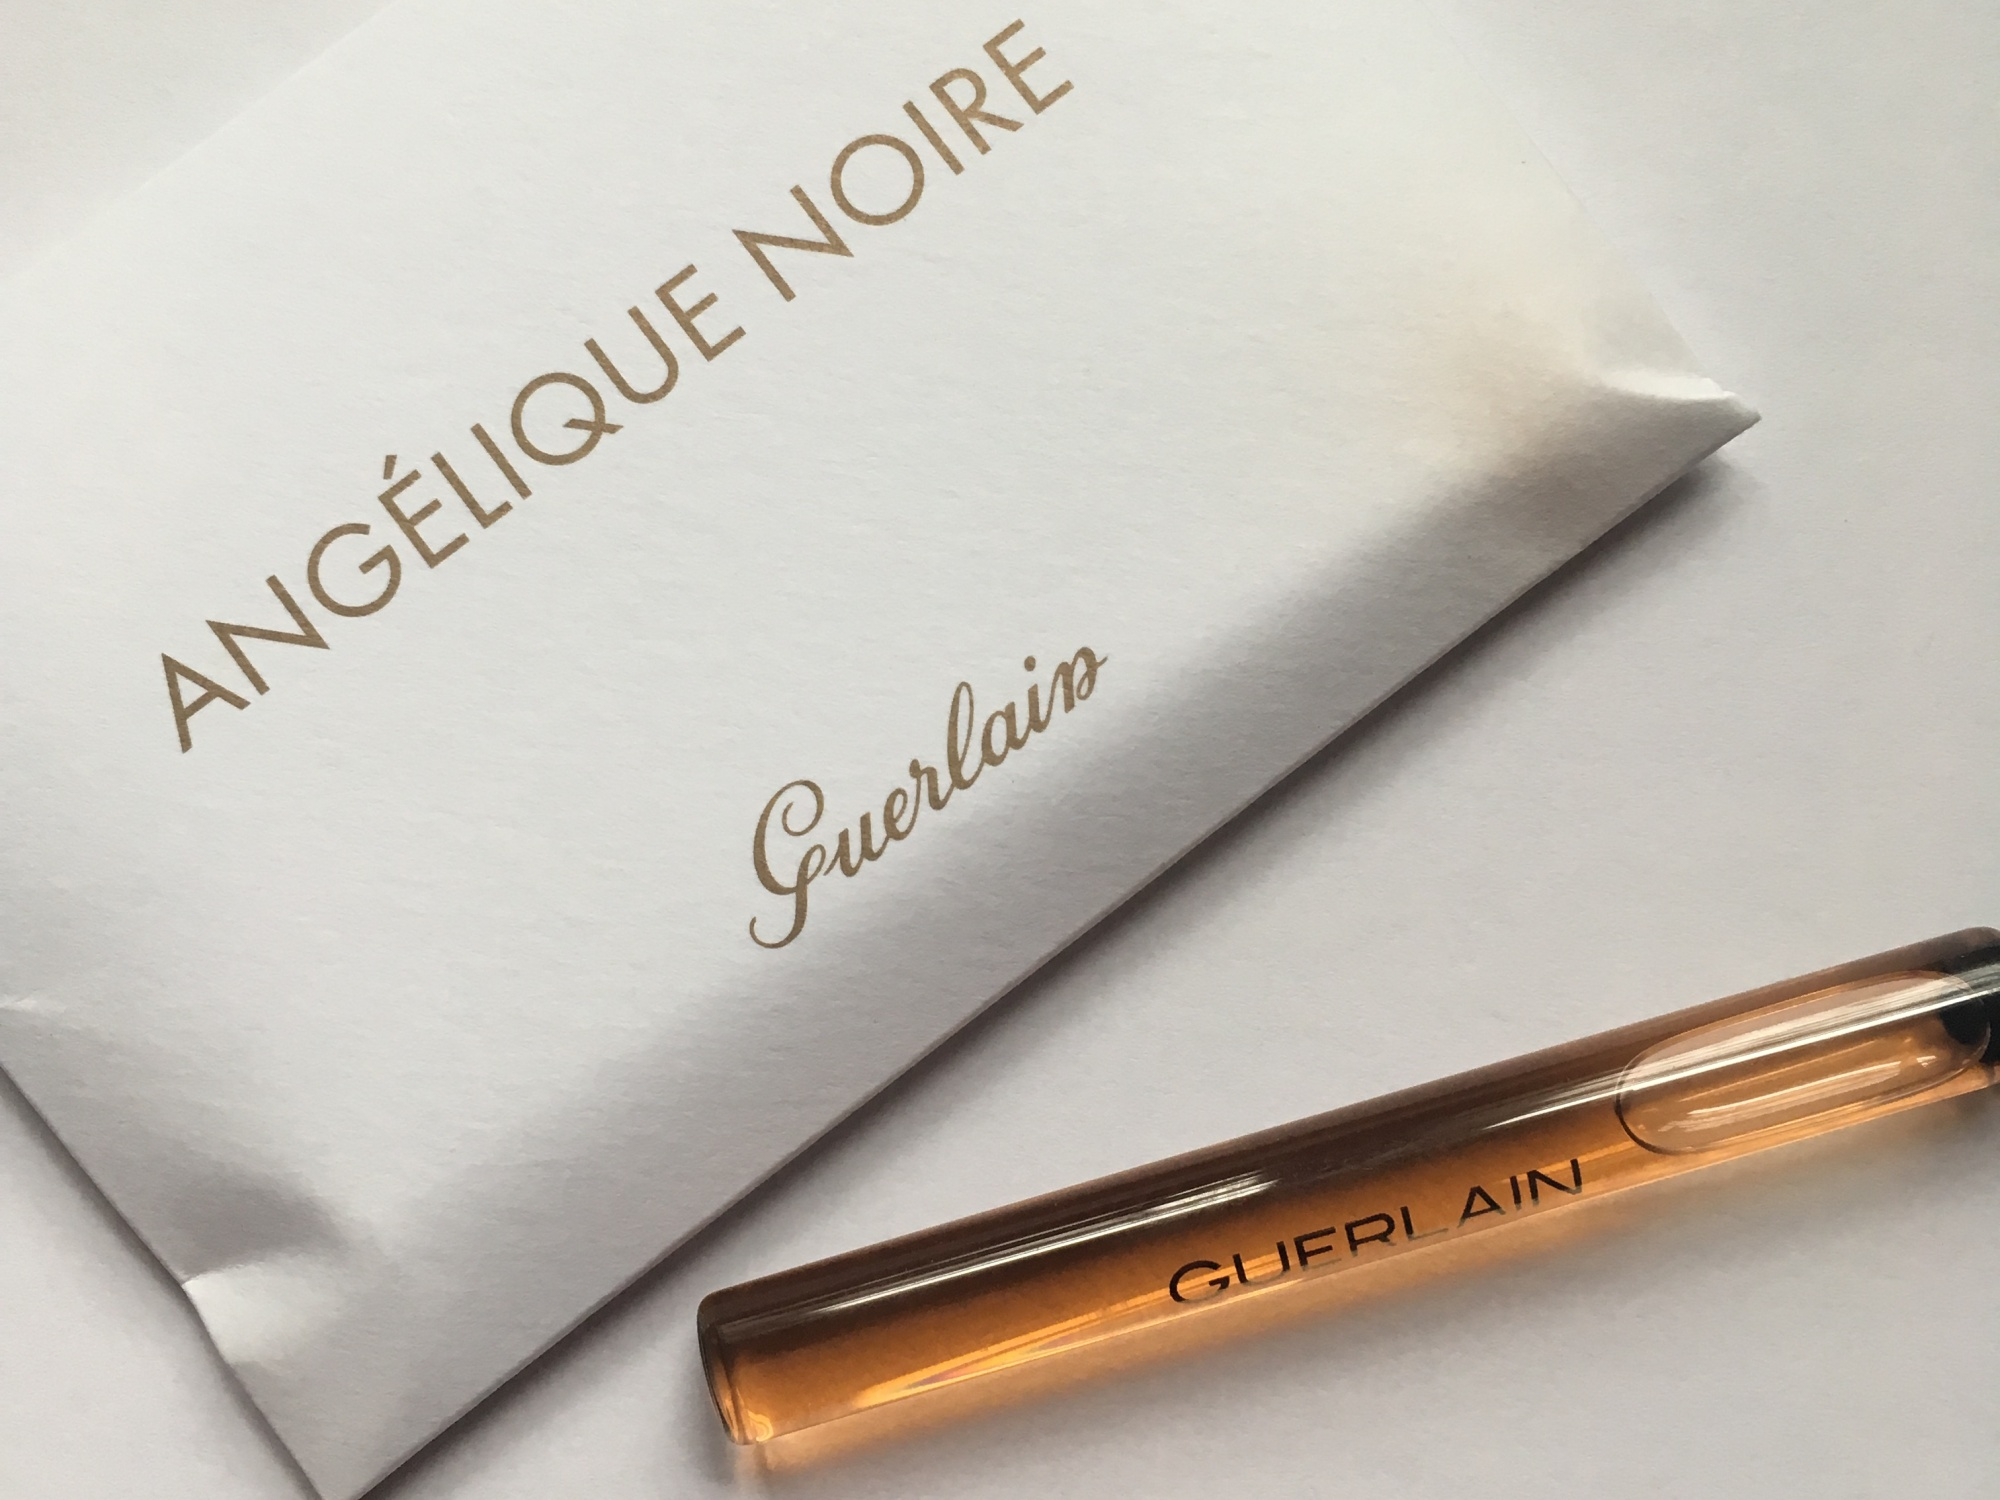 Angelique Noire by Larkin Small & Guerlain